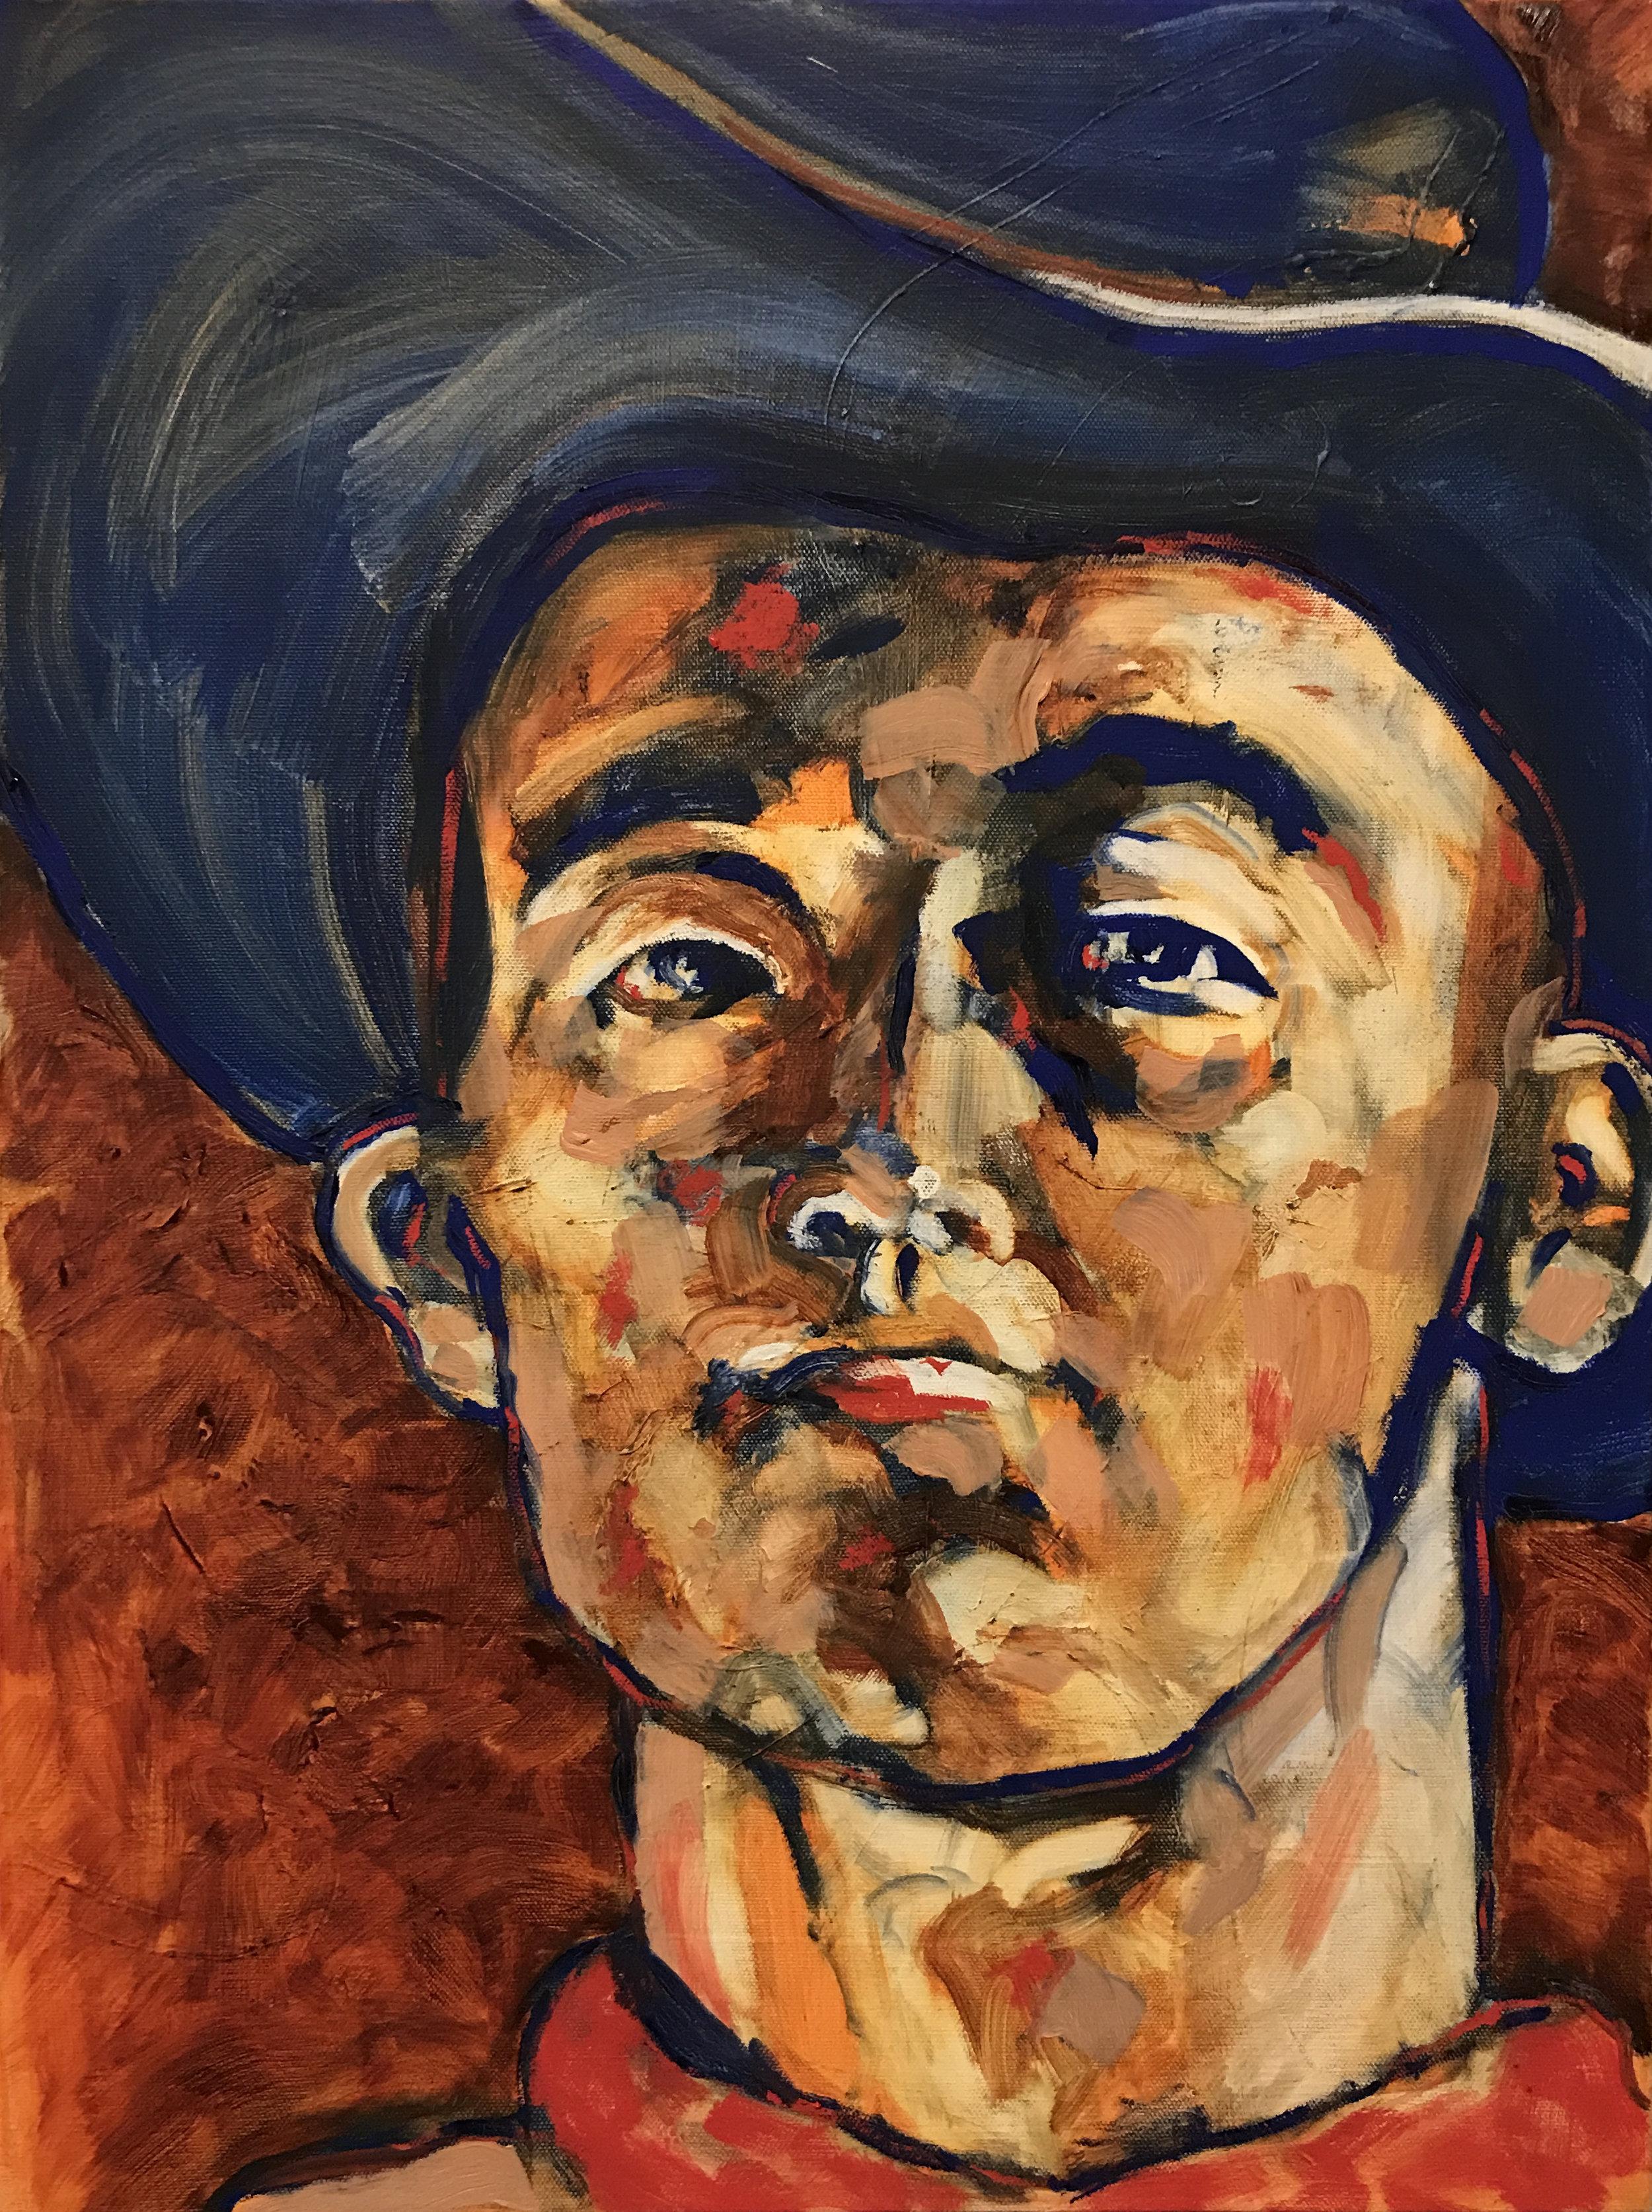 Richard Oil on Canvas 18x24  $600